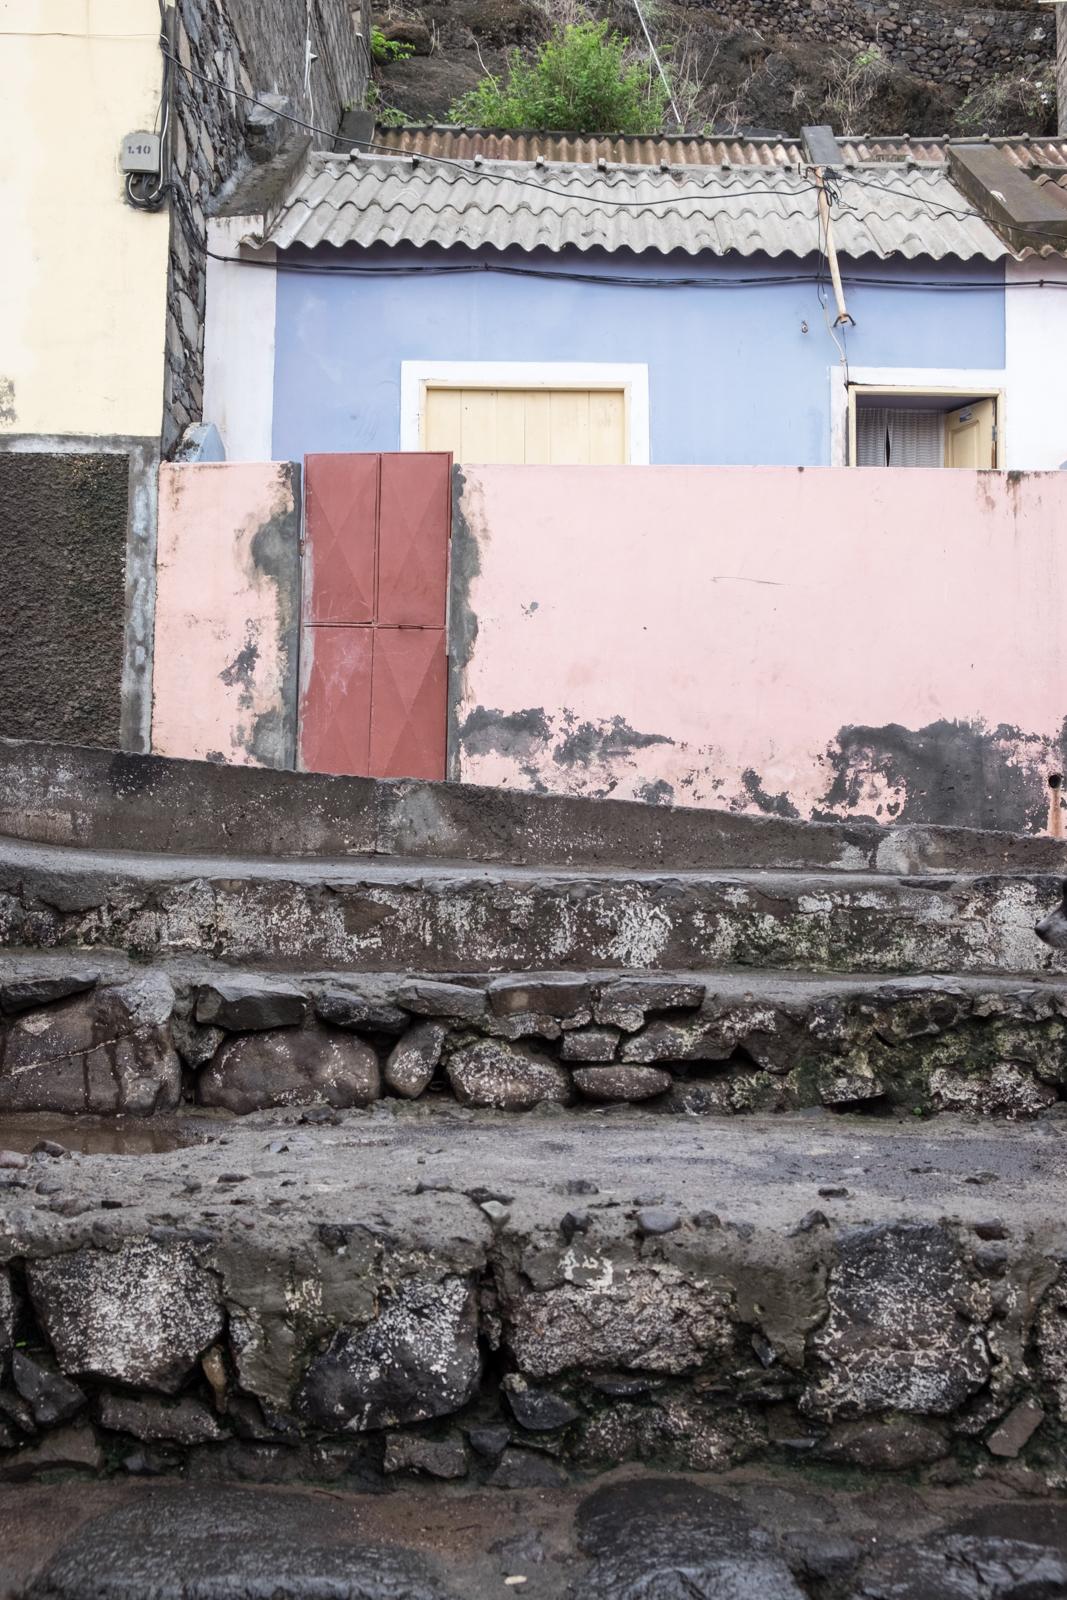 DSCF9914 - It never rains on Cabo Verde